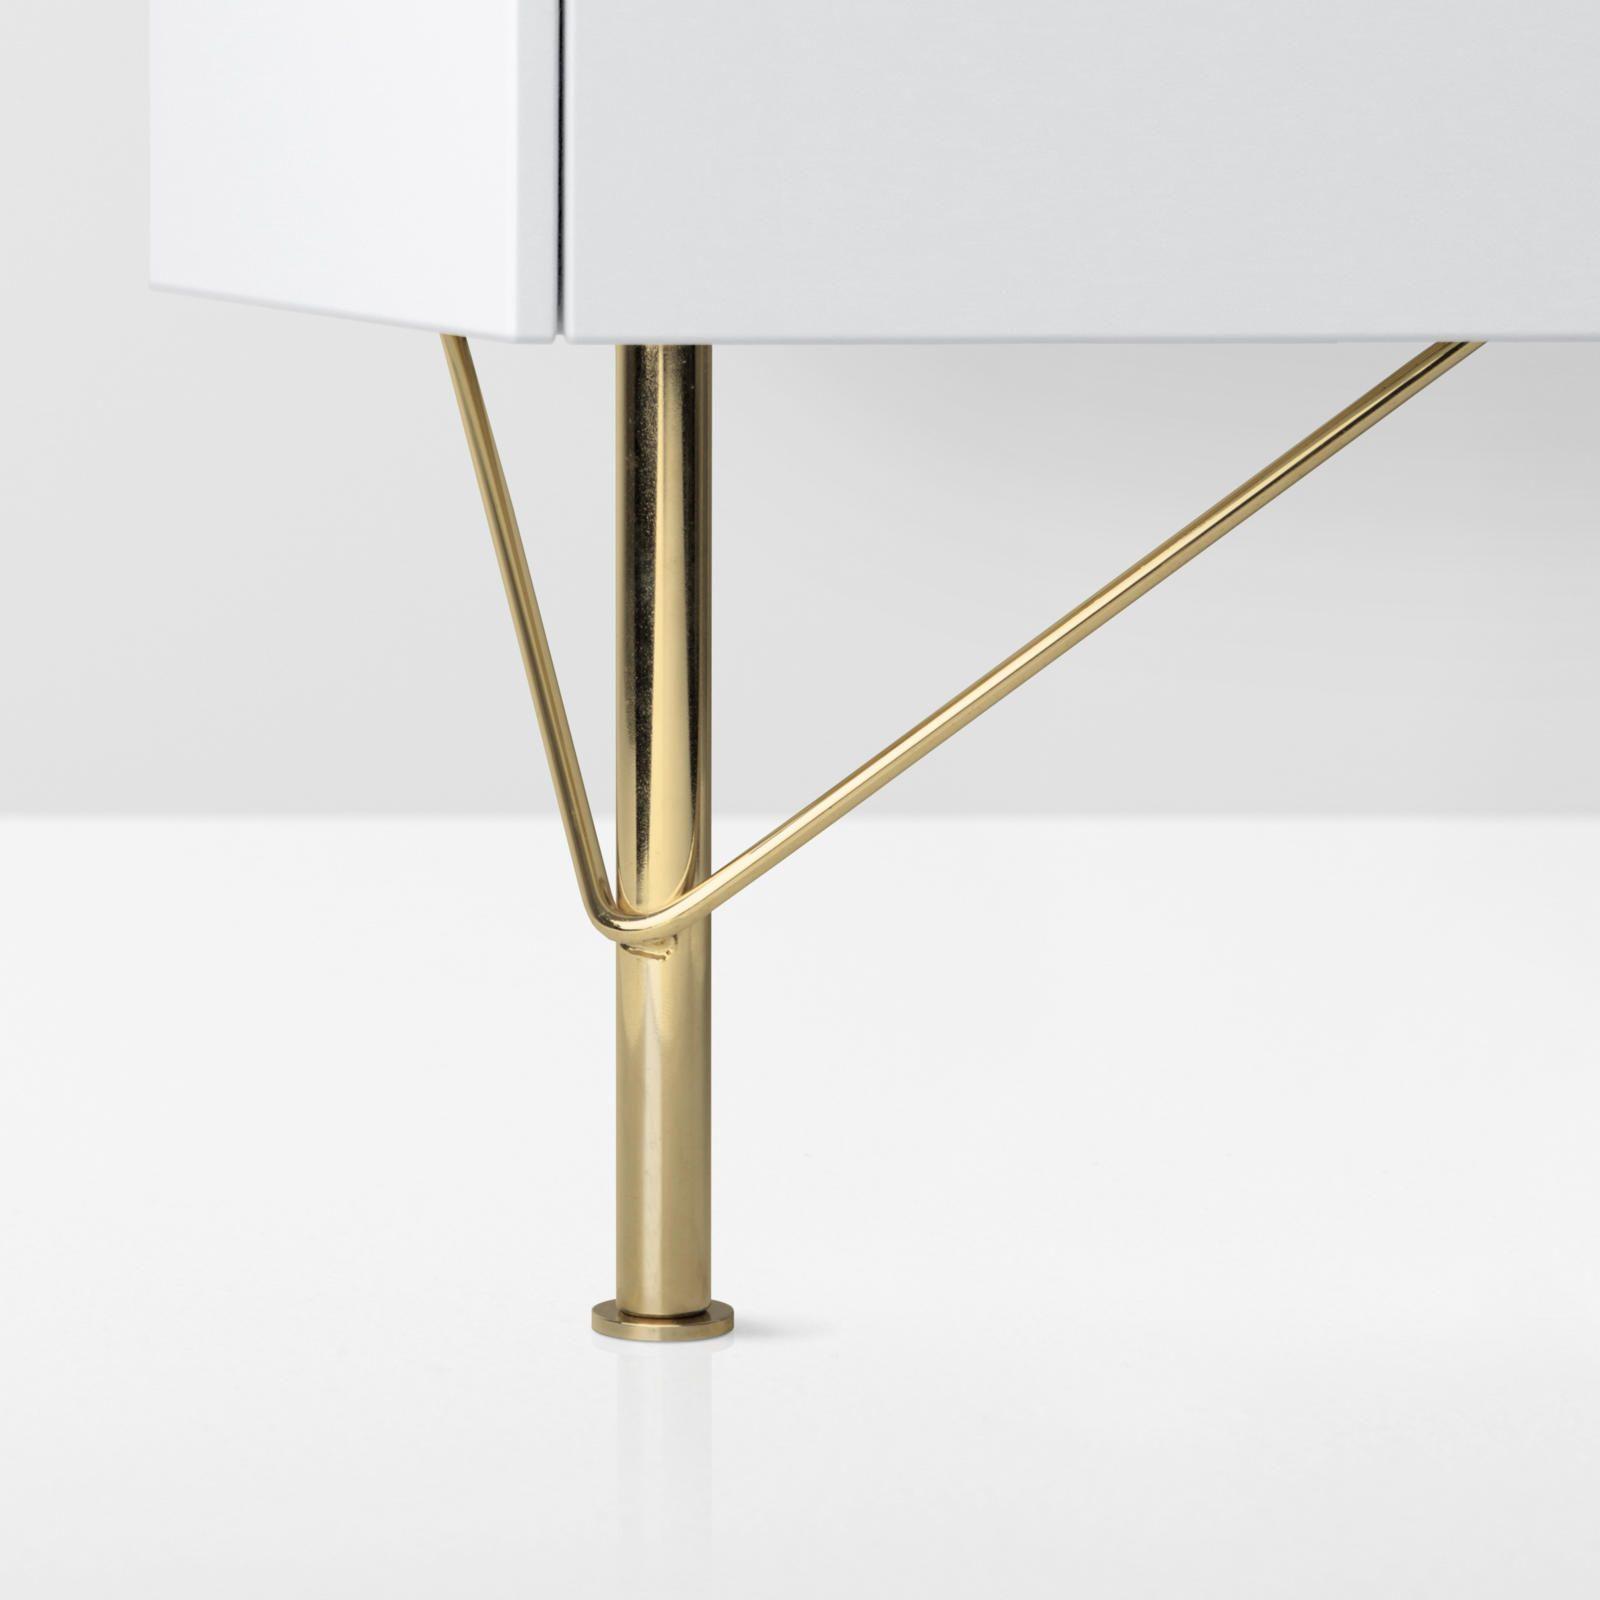 Gambe Per Mobili Ikea gambe per mobili ikea